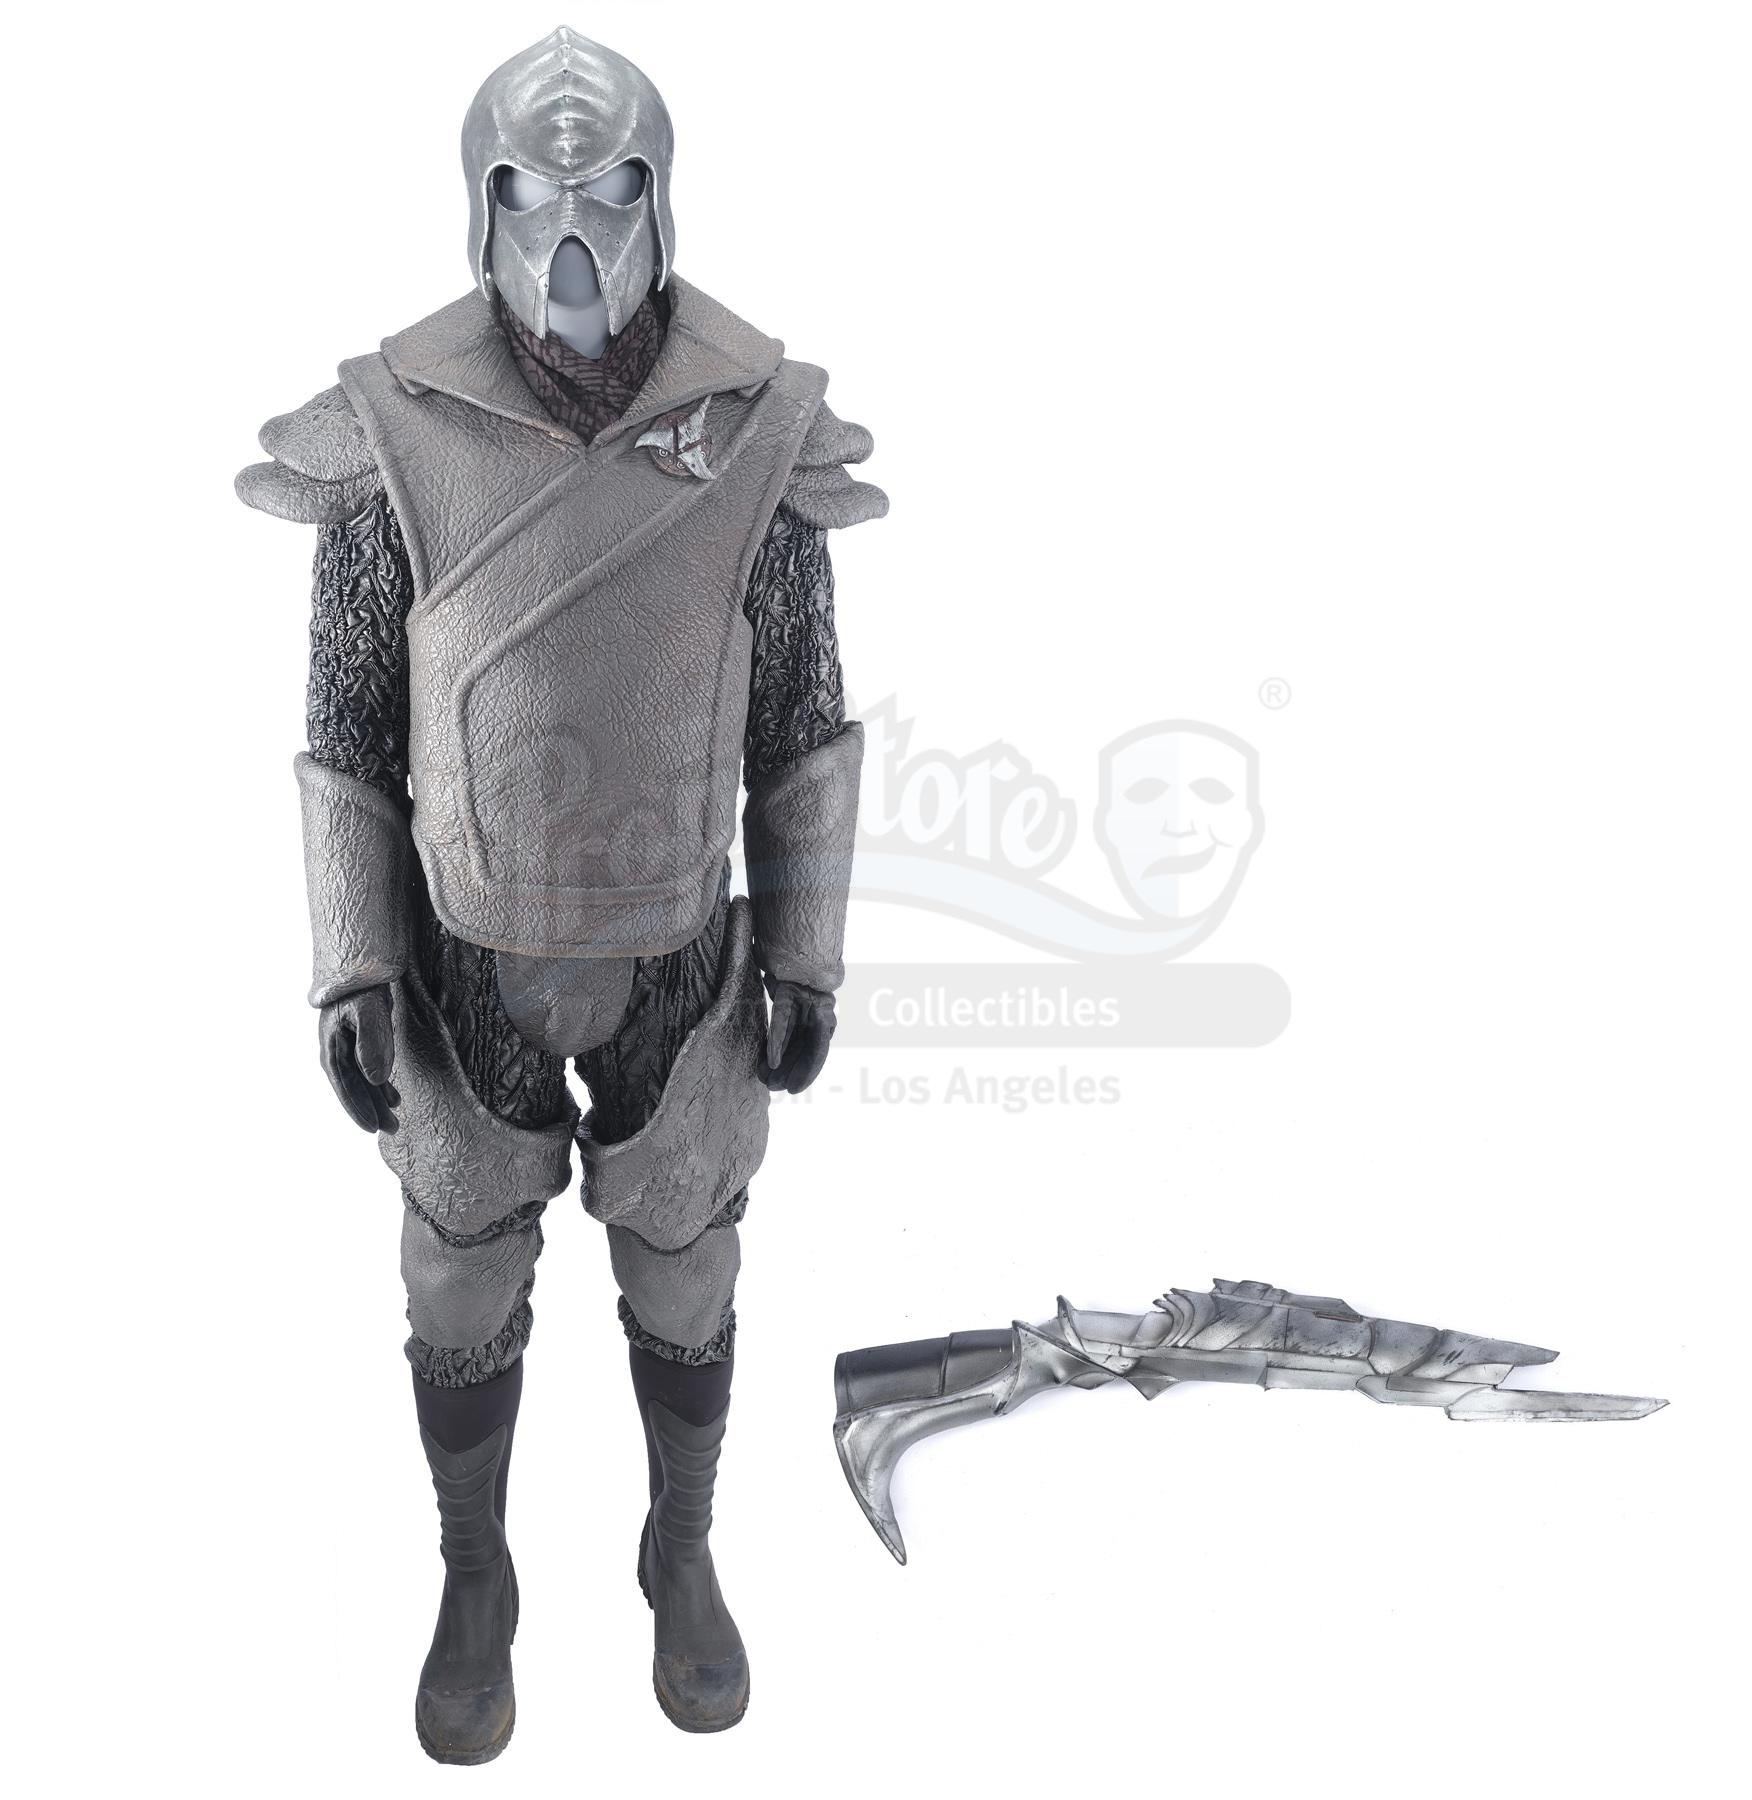 Lot # 260: STAR TREK INTO DARKNESS - Klingon Guard Uniform with Disruptor